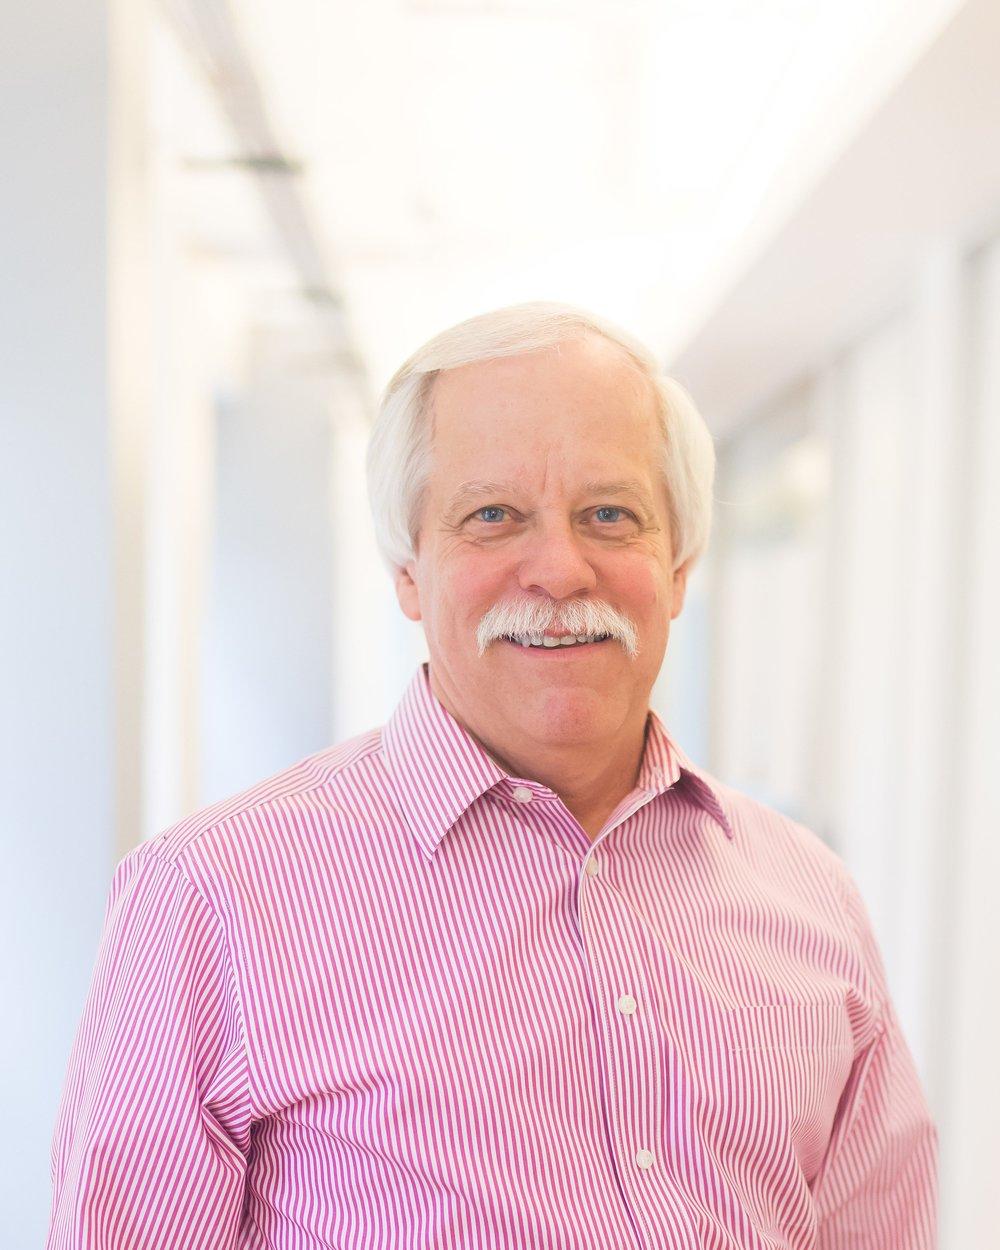 Vice President of Advisory Services David Halford